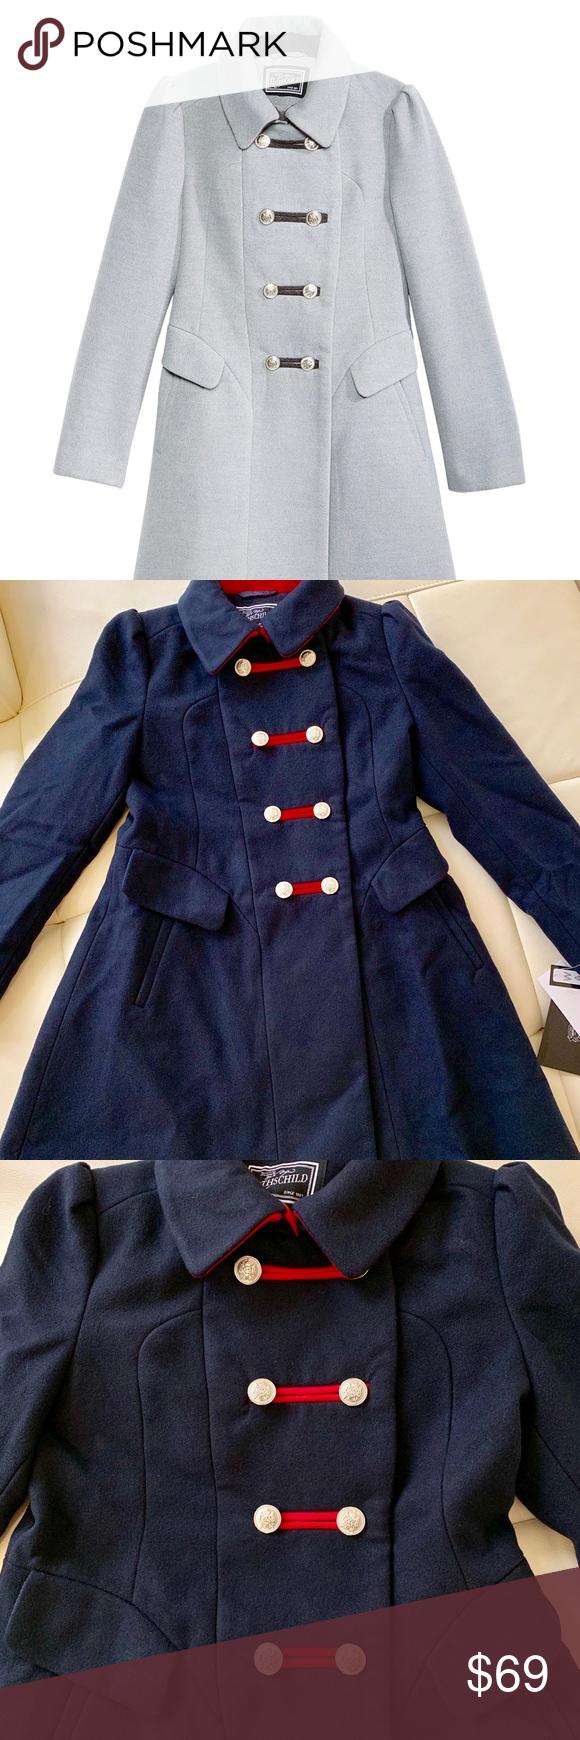 Pin On Kids Coat Jacket Dress Clothes Stylish Trendy Chic Fun Beautiful Comfortable [ 1740 x 580 Pixel ]